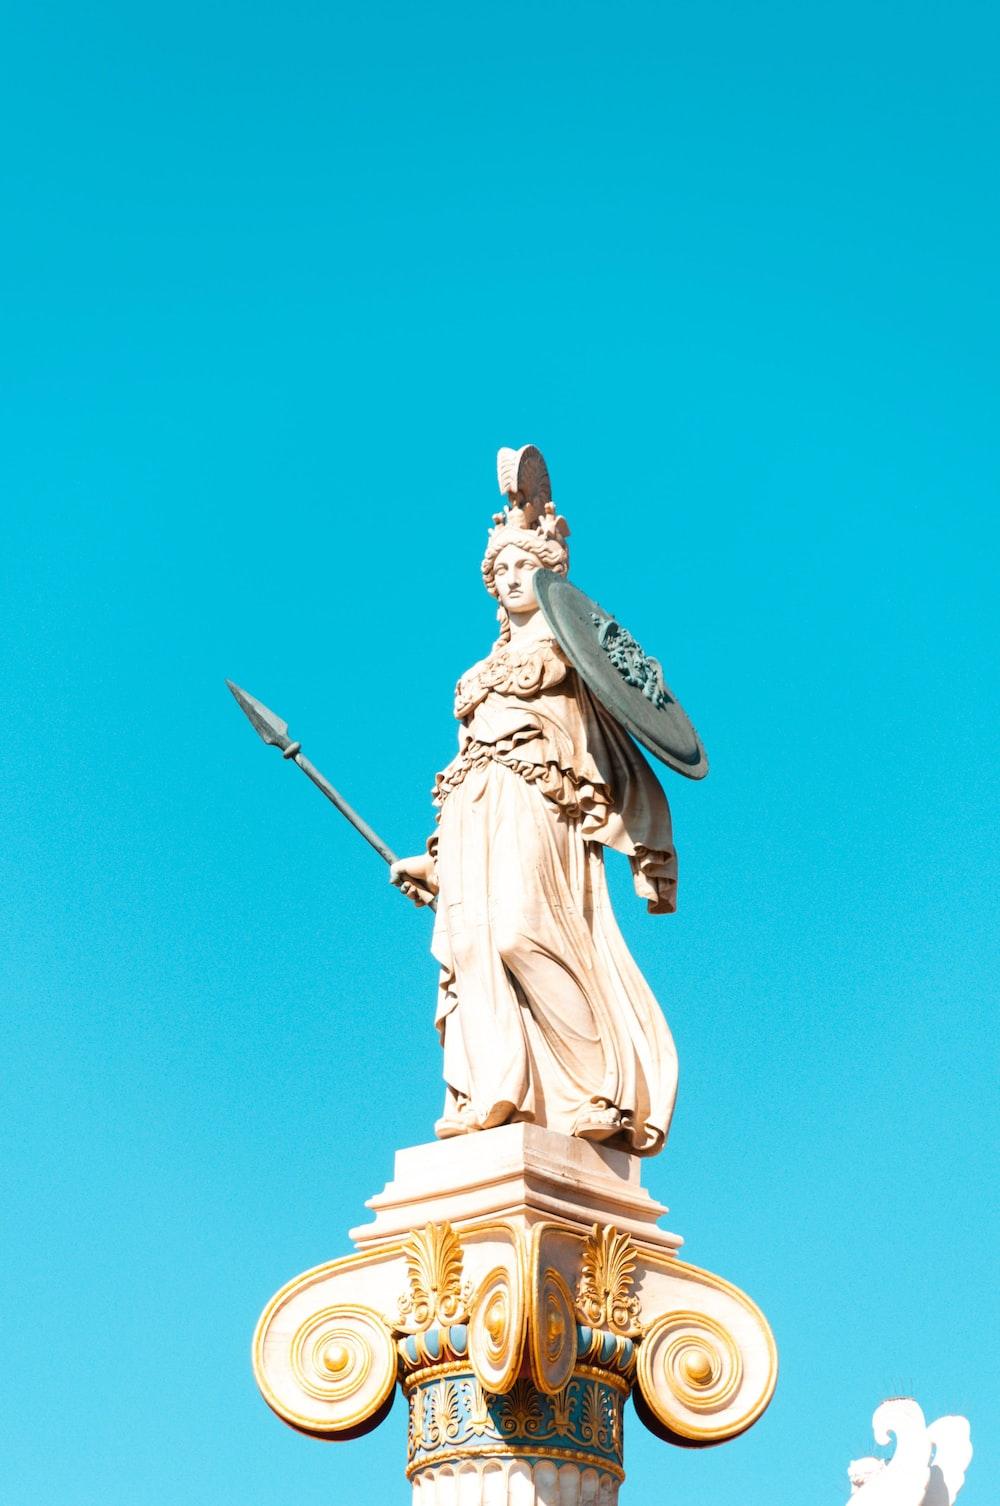 man holding a sword statue